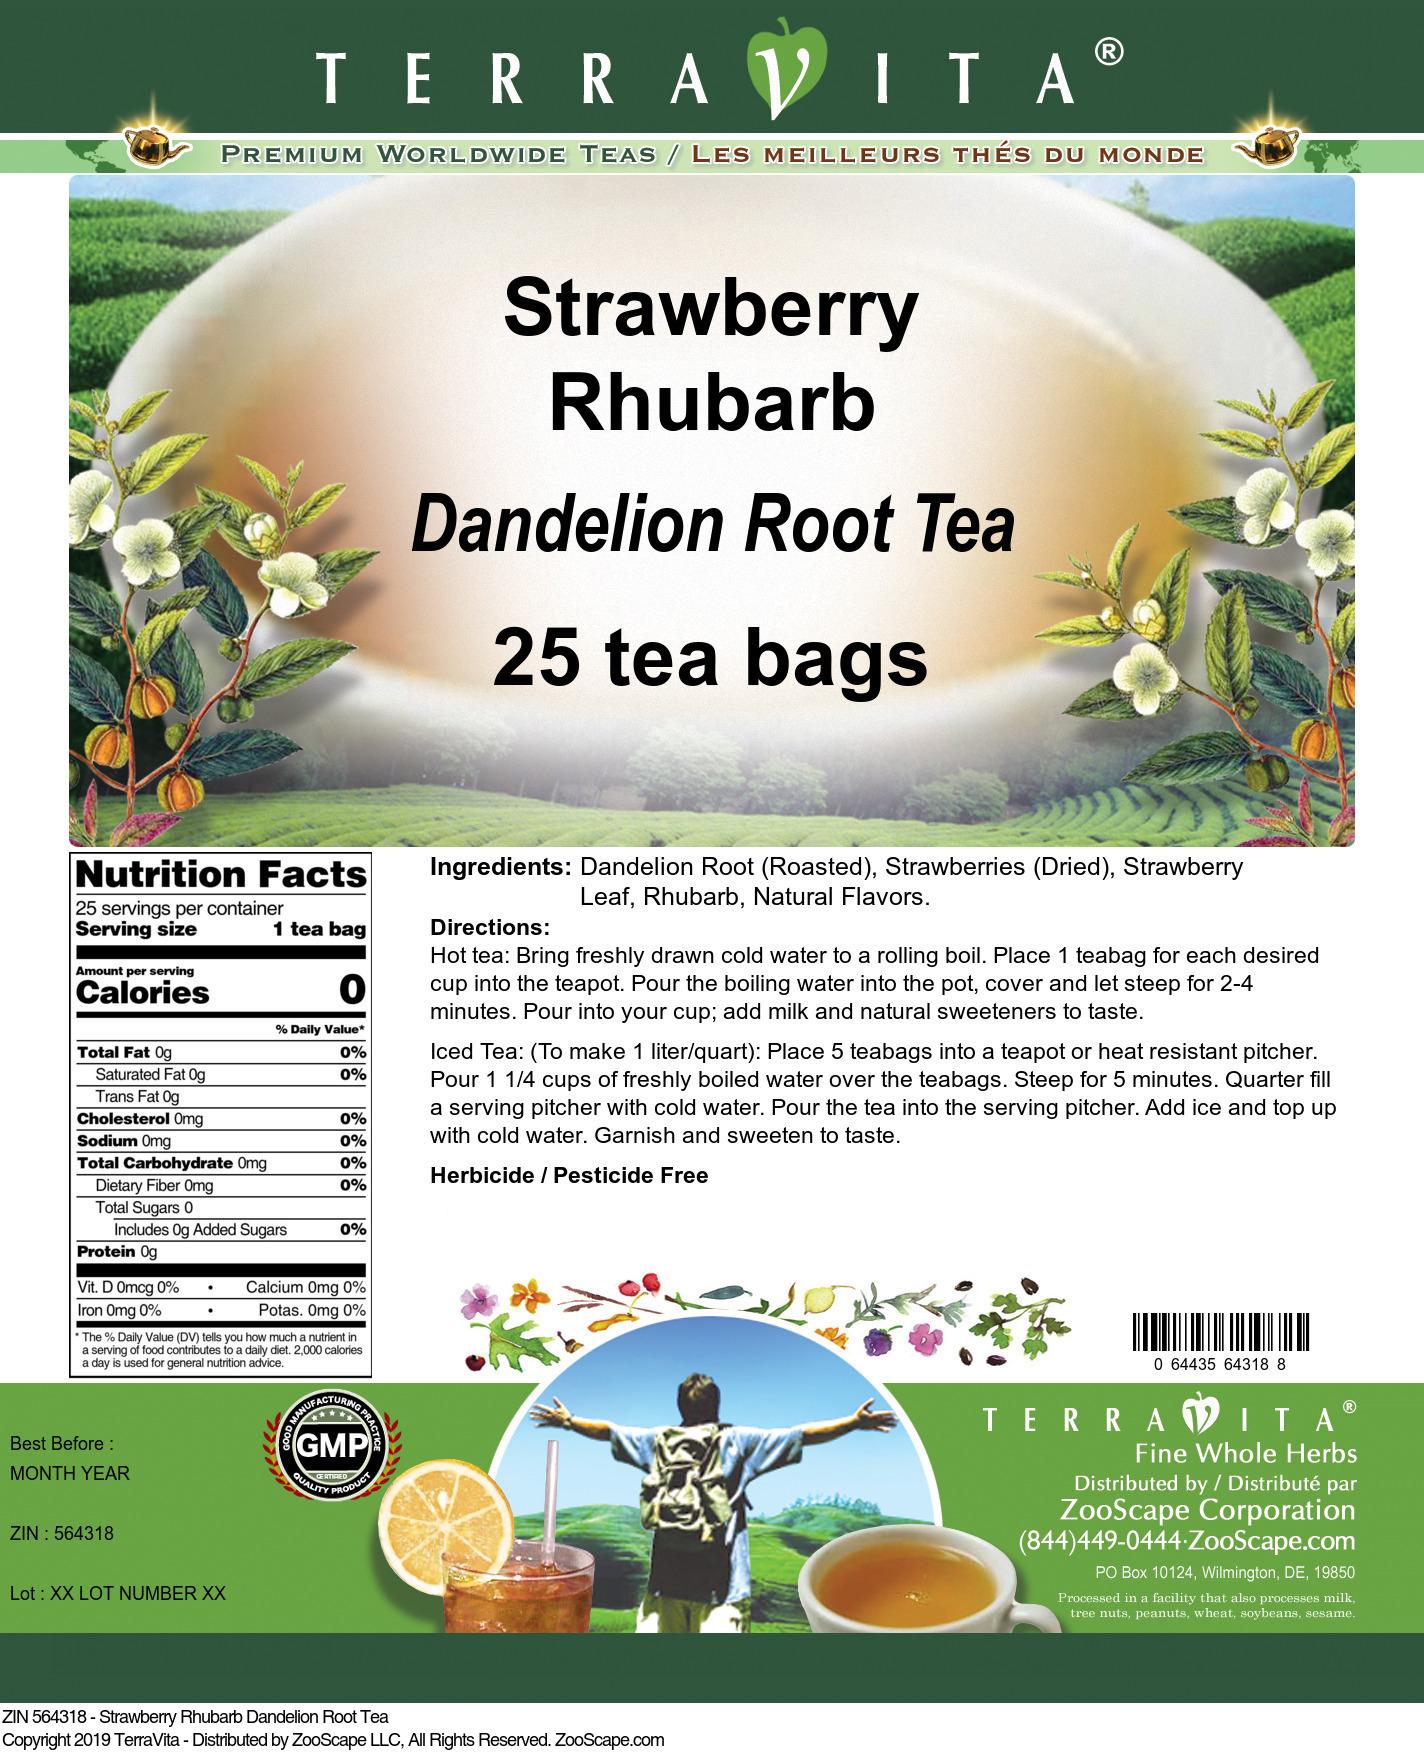 Strawberry Rhubarb Dandelion Root Tea